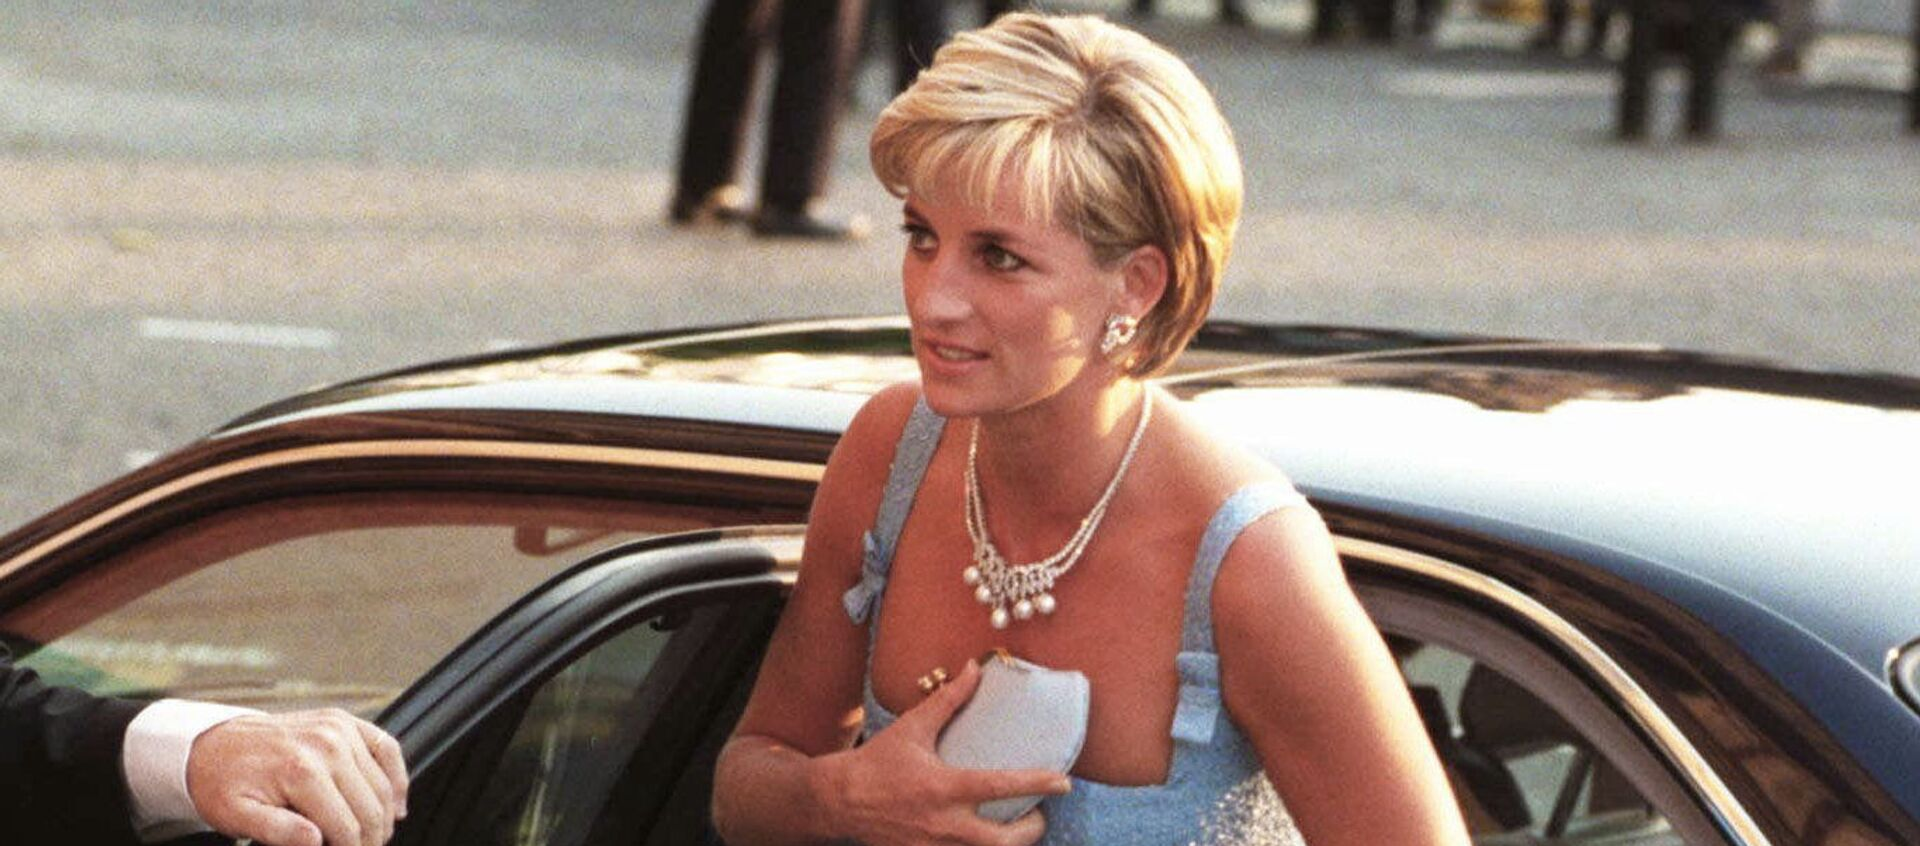 La princesa Diana sale de su coche - Sputnik Mundo, 1920, 29.03.2020